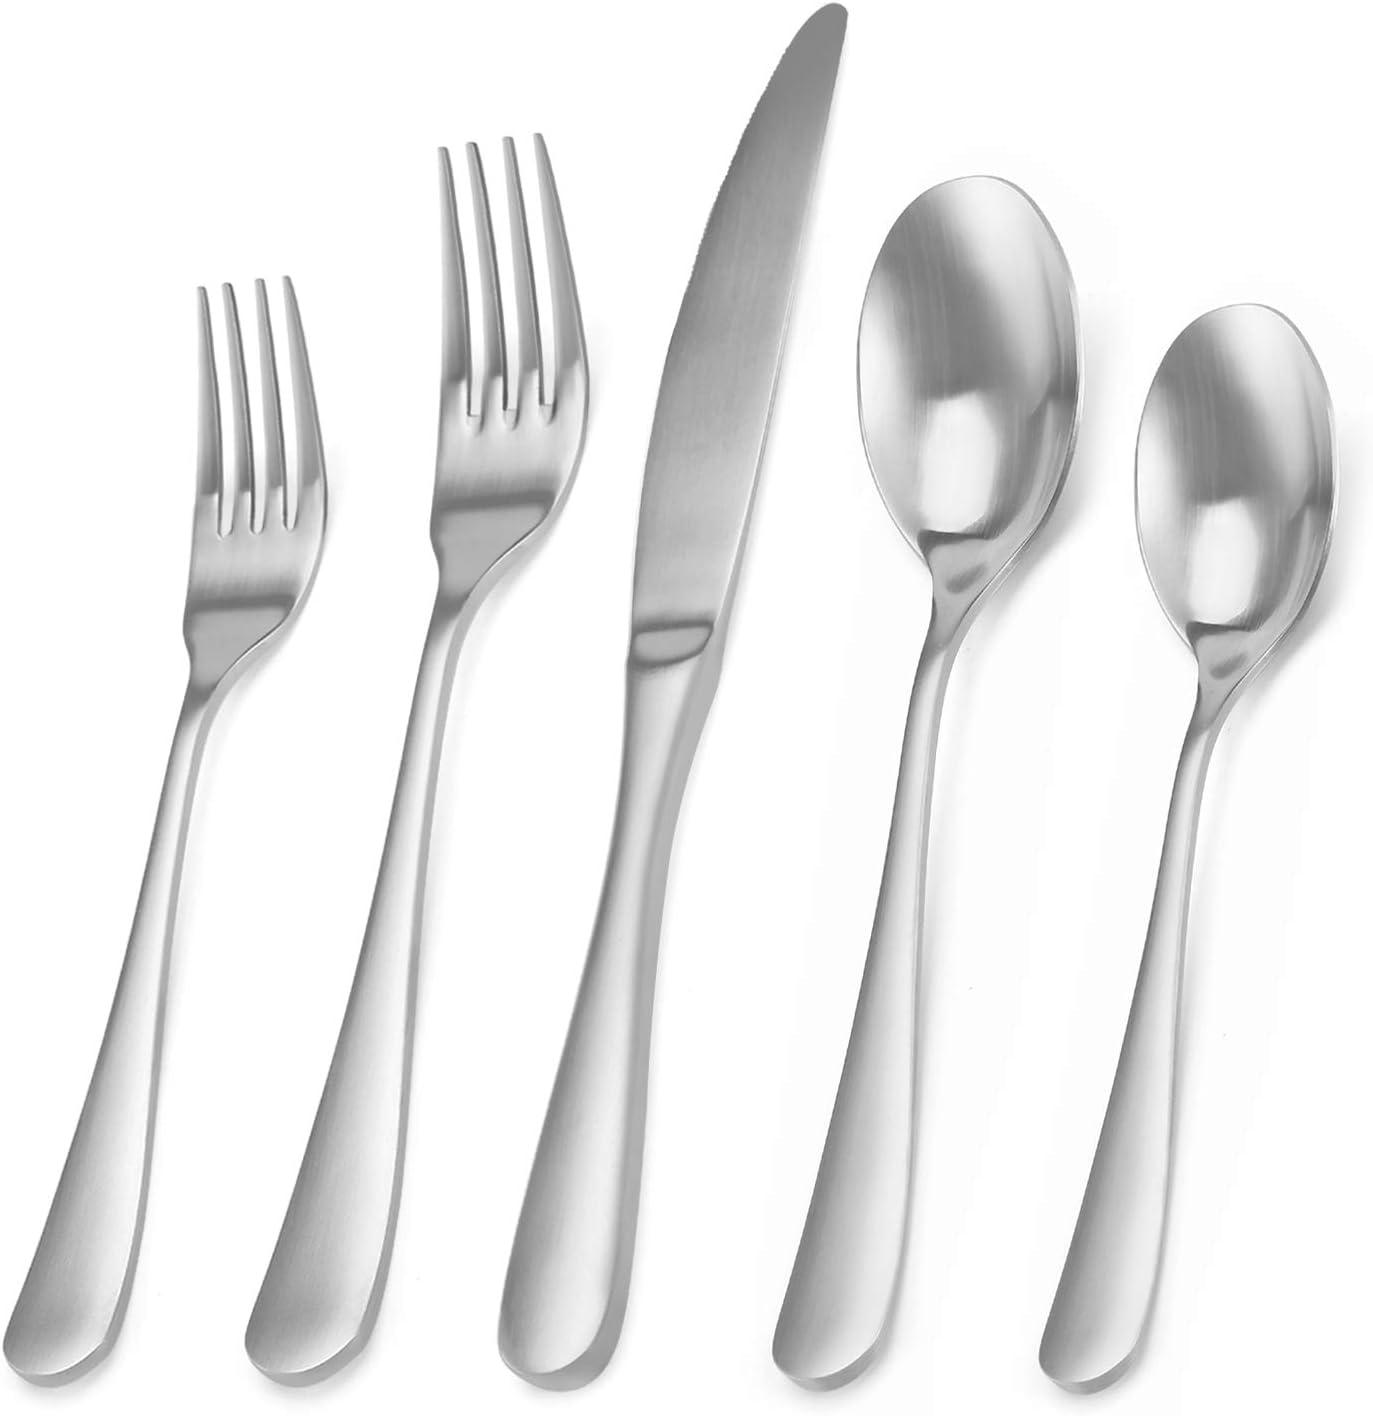 Matte Silverware Set, Bysta 20-Piece Stainless Steel Flatware Set, Kitchen Utensil Set Service for 4, Tableware Cutlery Set for Home and Restaurant, Satin Finish, Dishwasher Safe